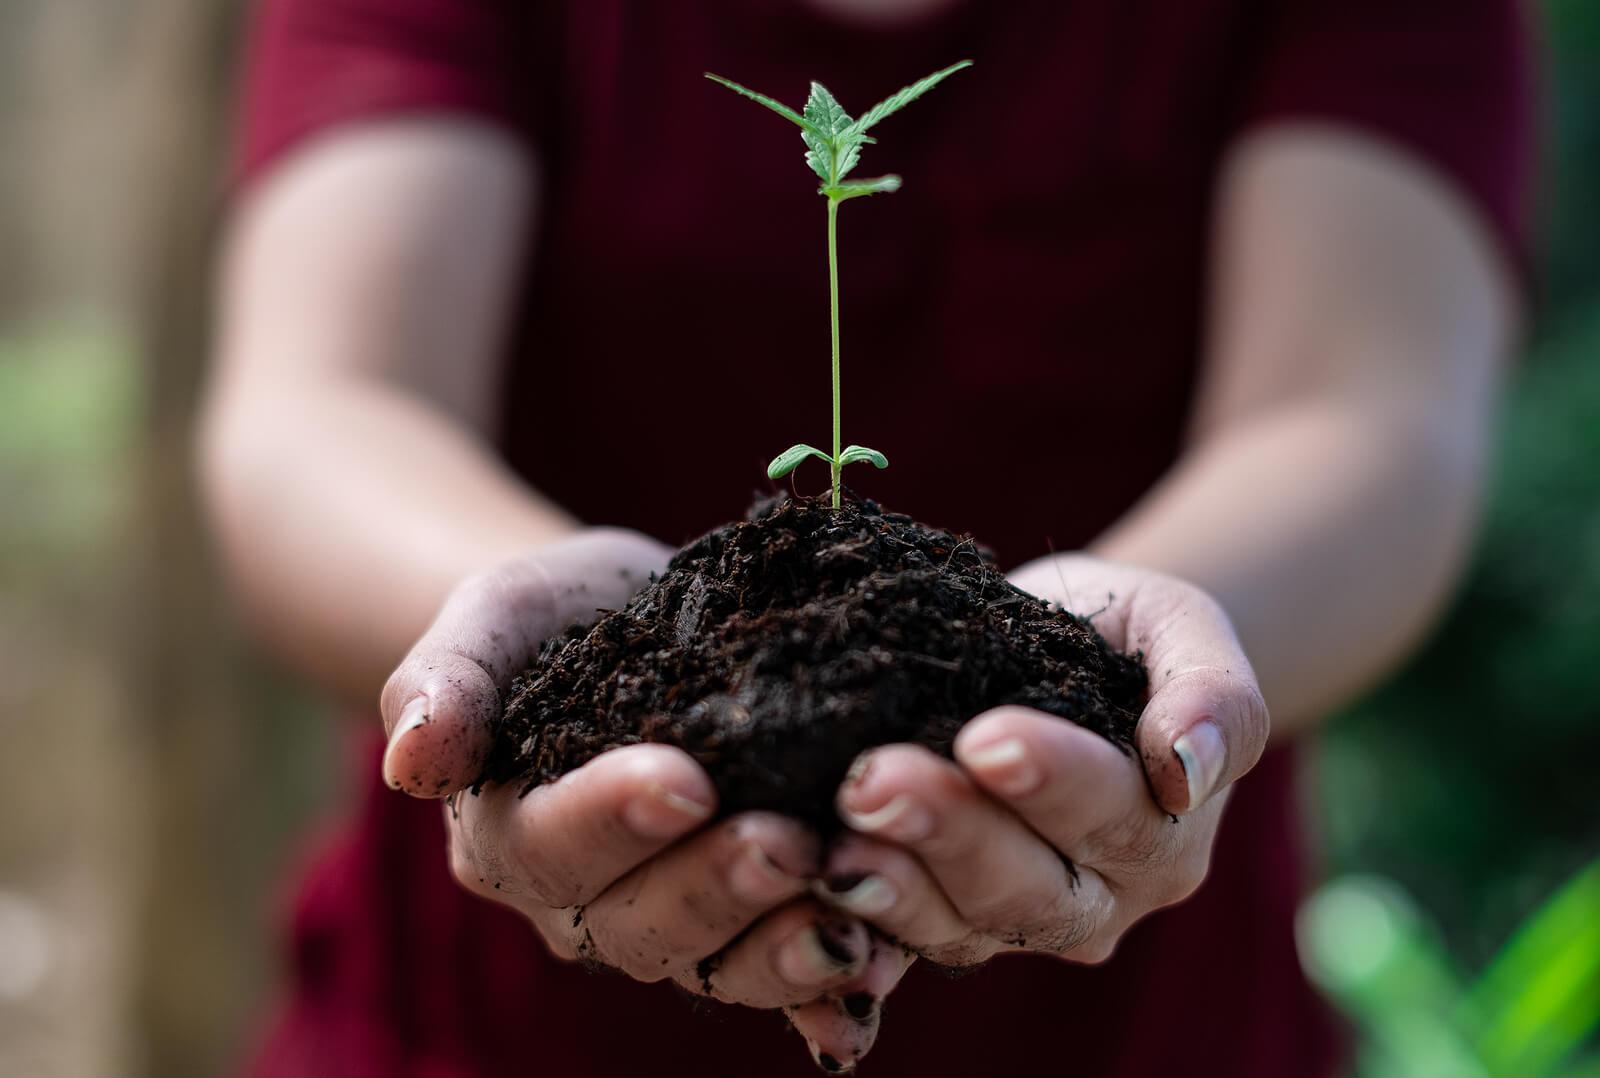 Steps growing cannabis